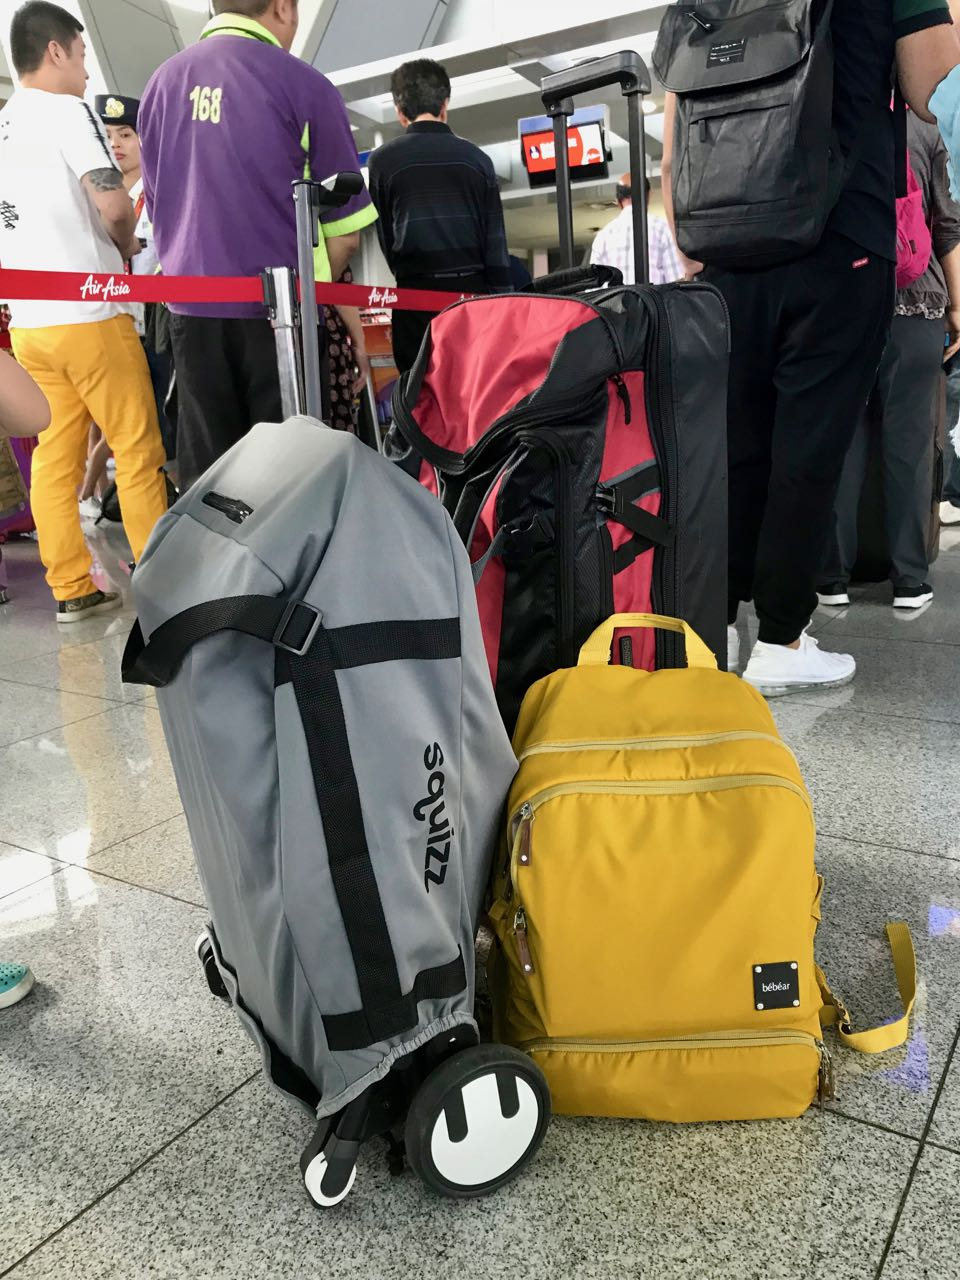 Gear - travel stroller, backpack, duffle bag